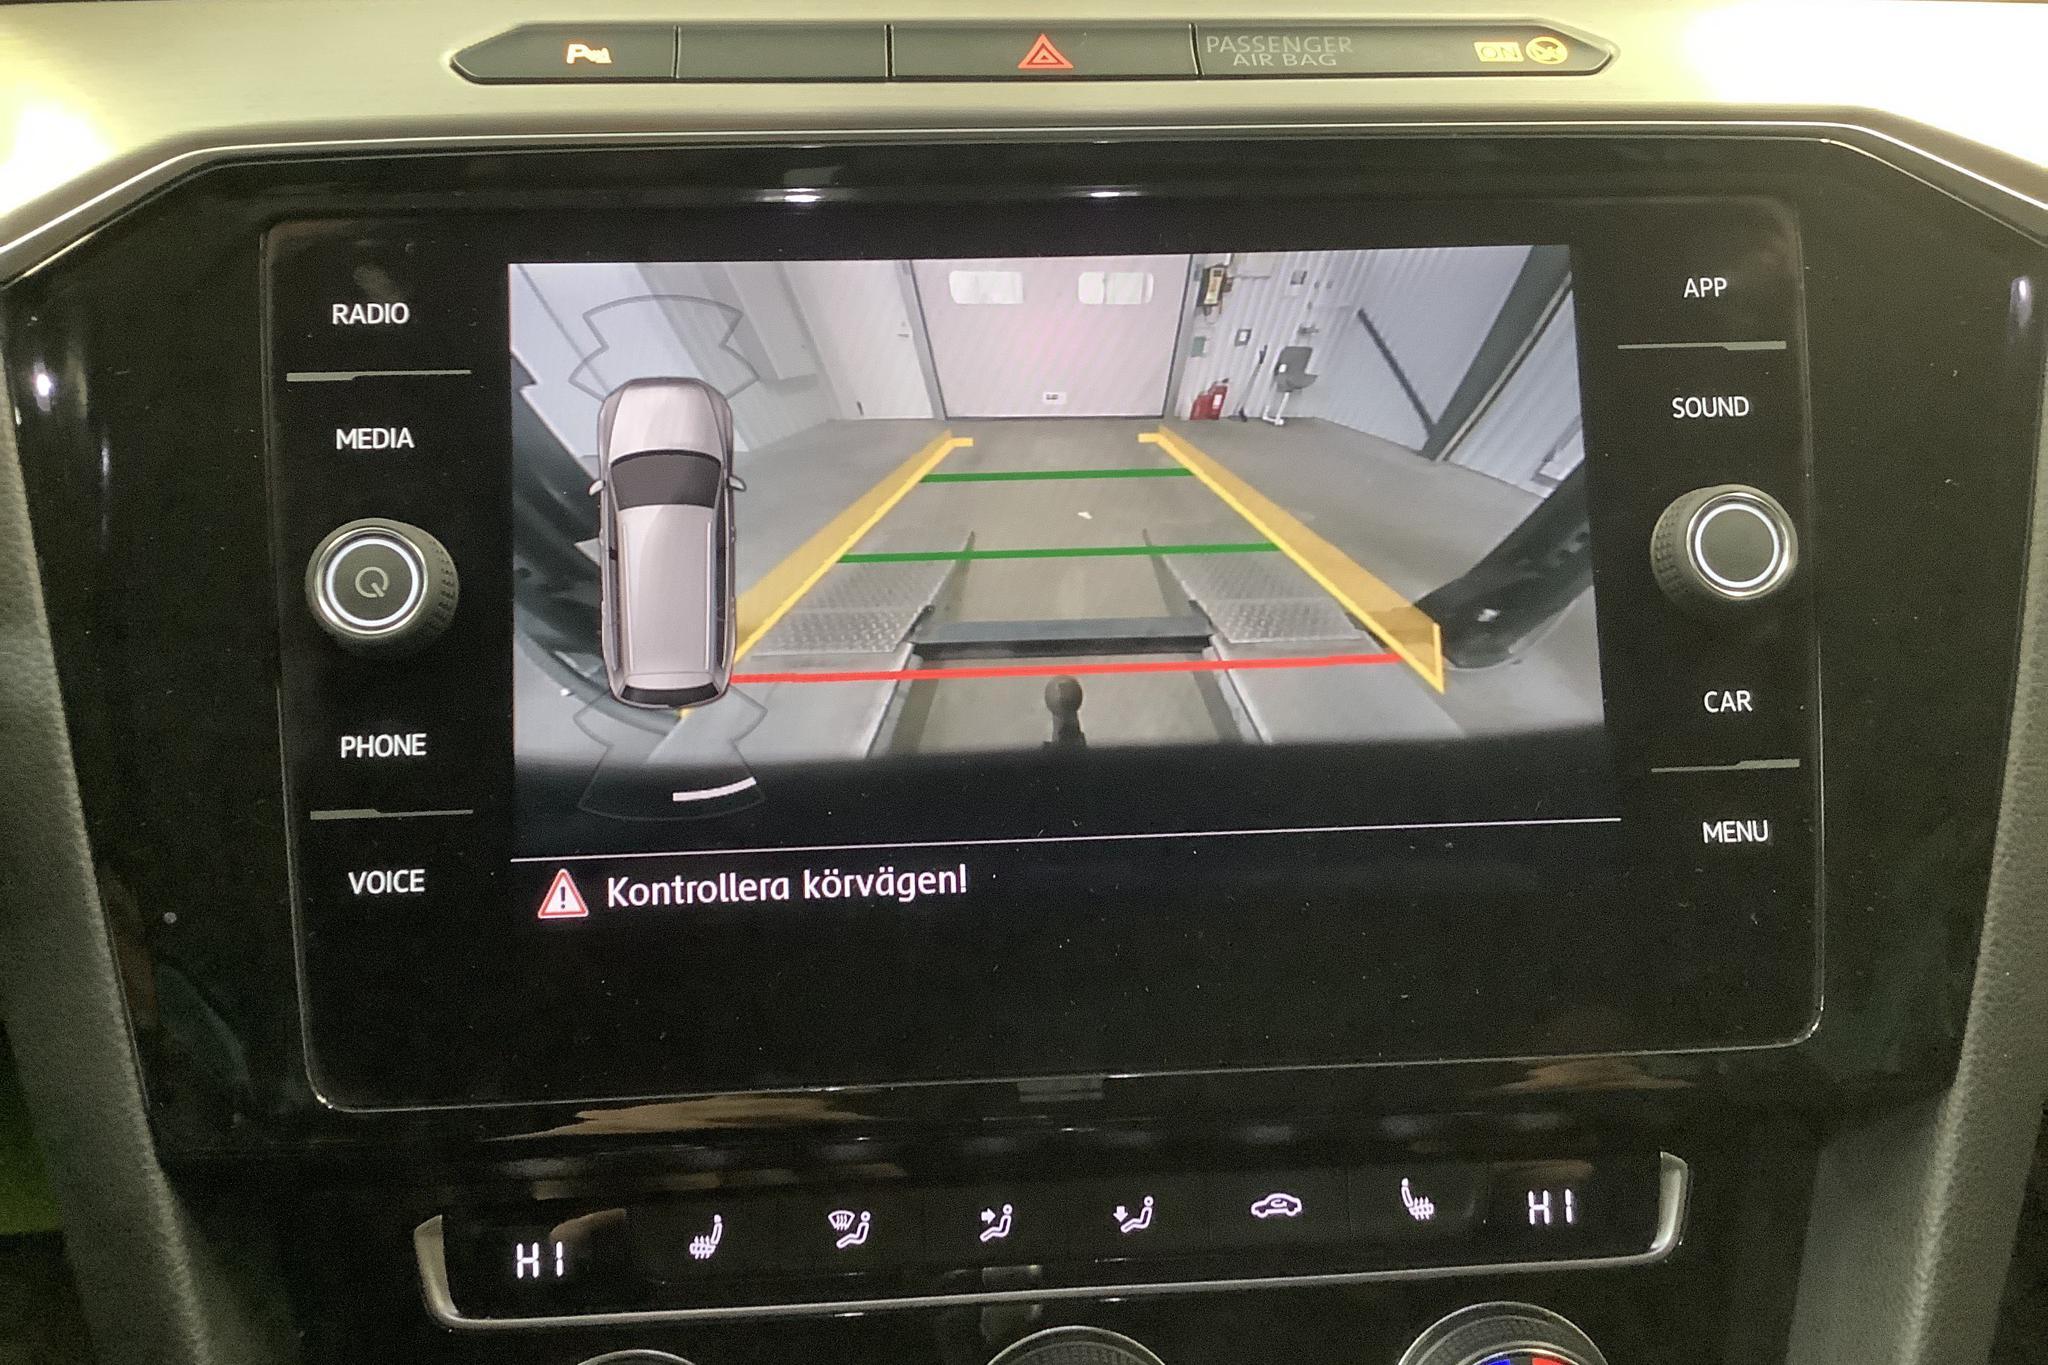 VW Passat 2.0 TDI Sportscombi 4MOTION (190hk) - 200 890 km - Automatic - black - 2018